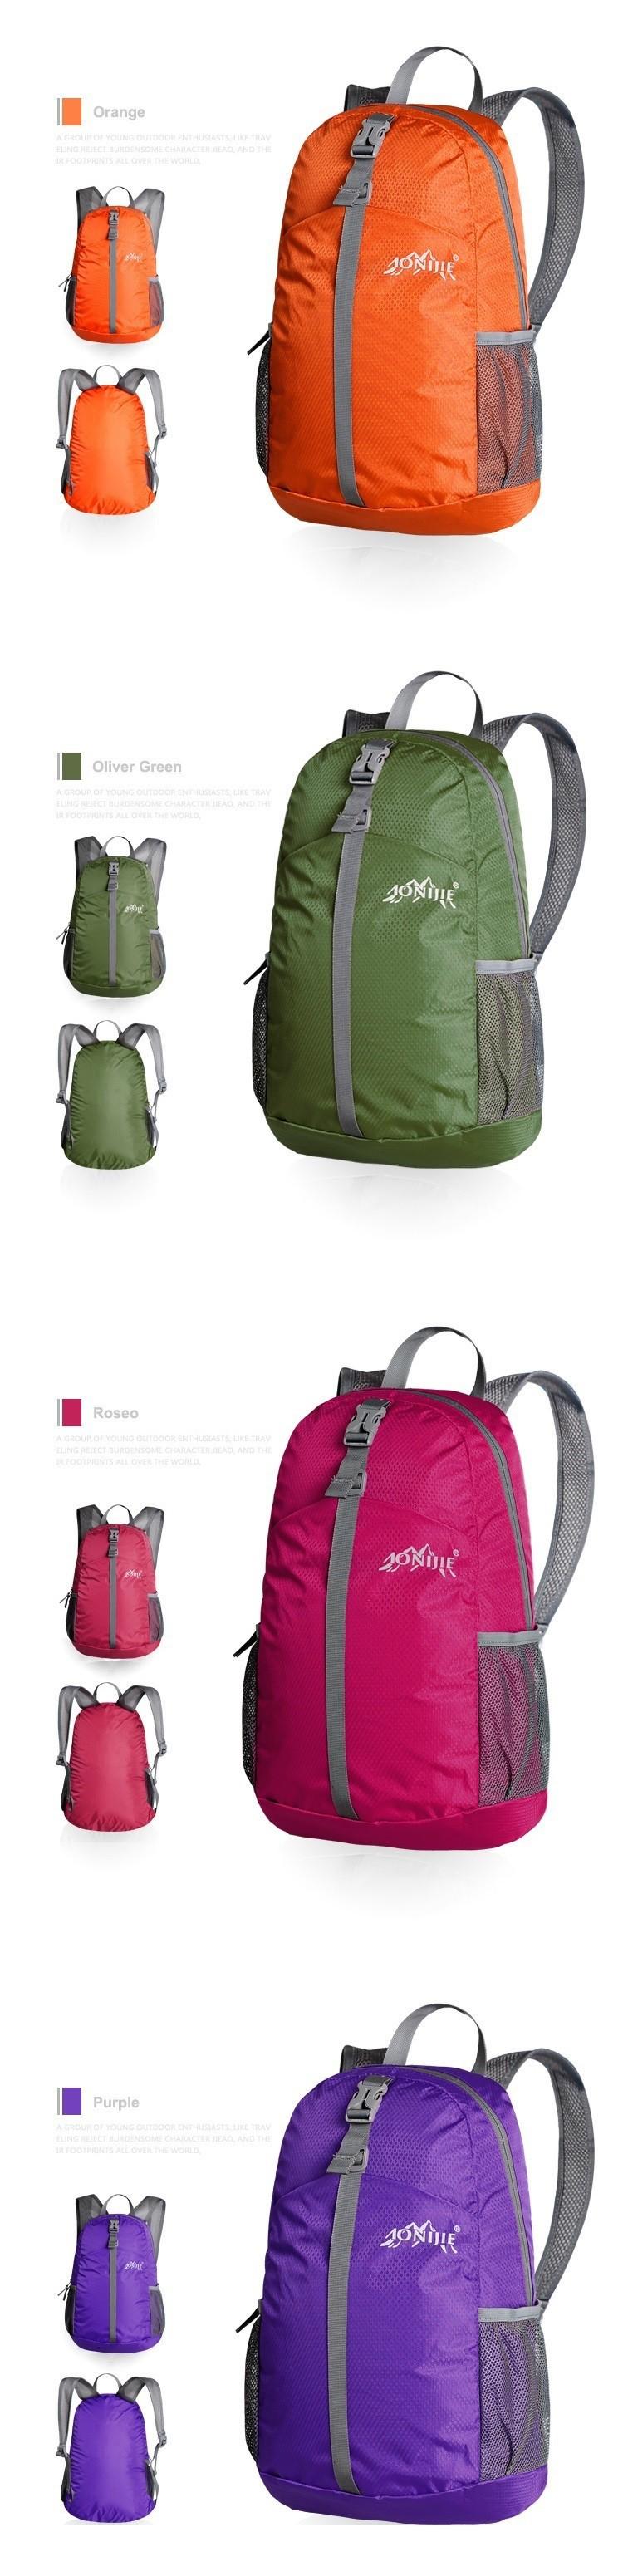 Backpack - Lightweight Outdoor Sports Backpack